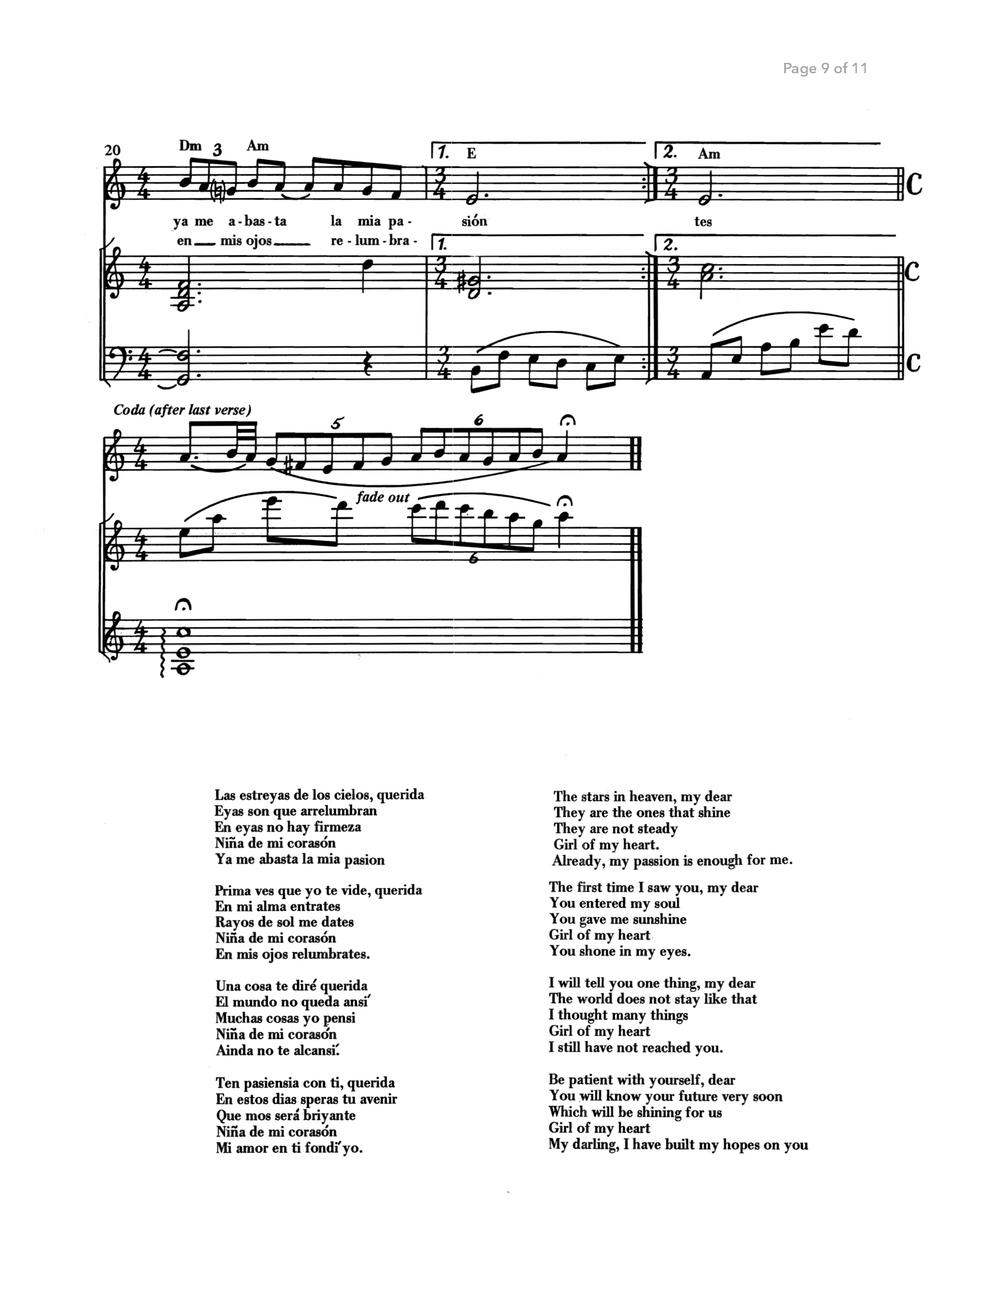 Ladino_Sephardic Music_Page_09.png